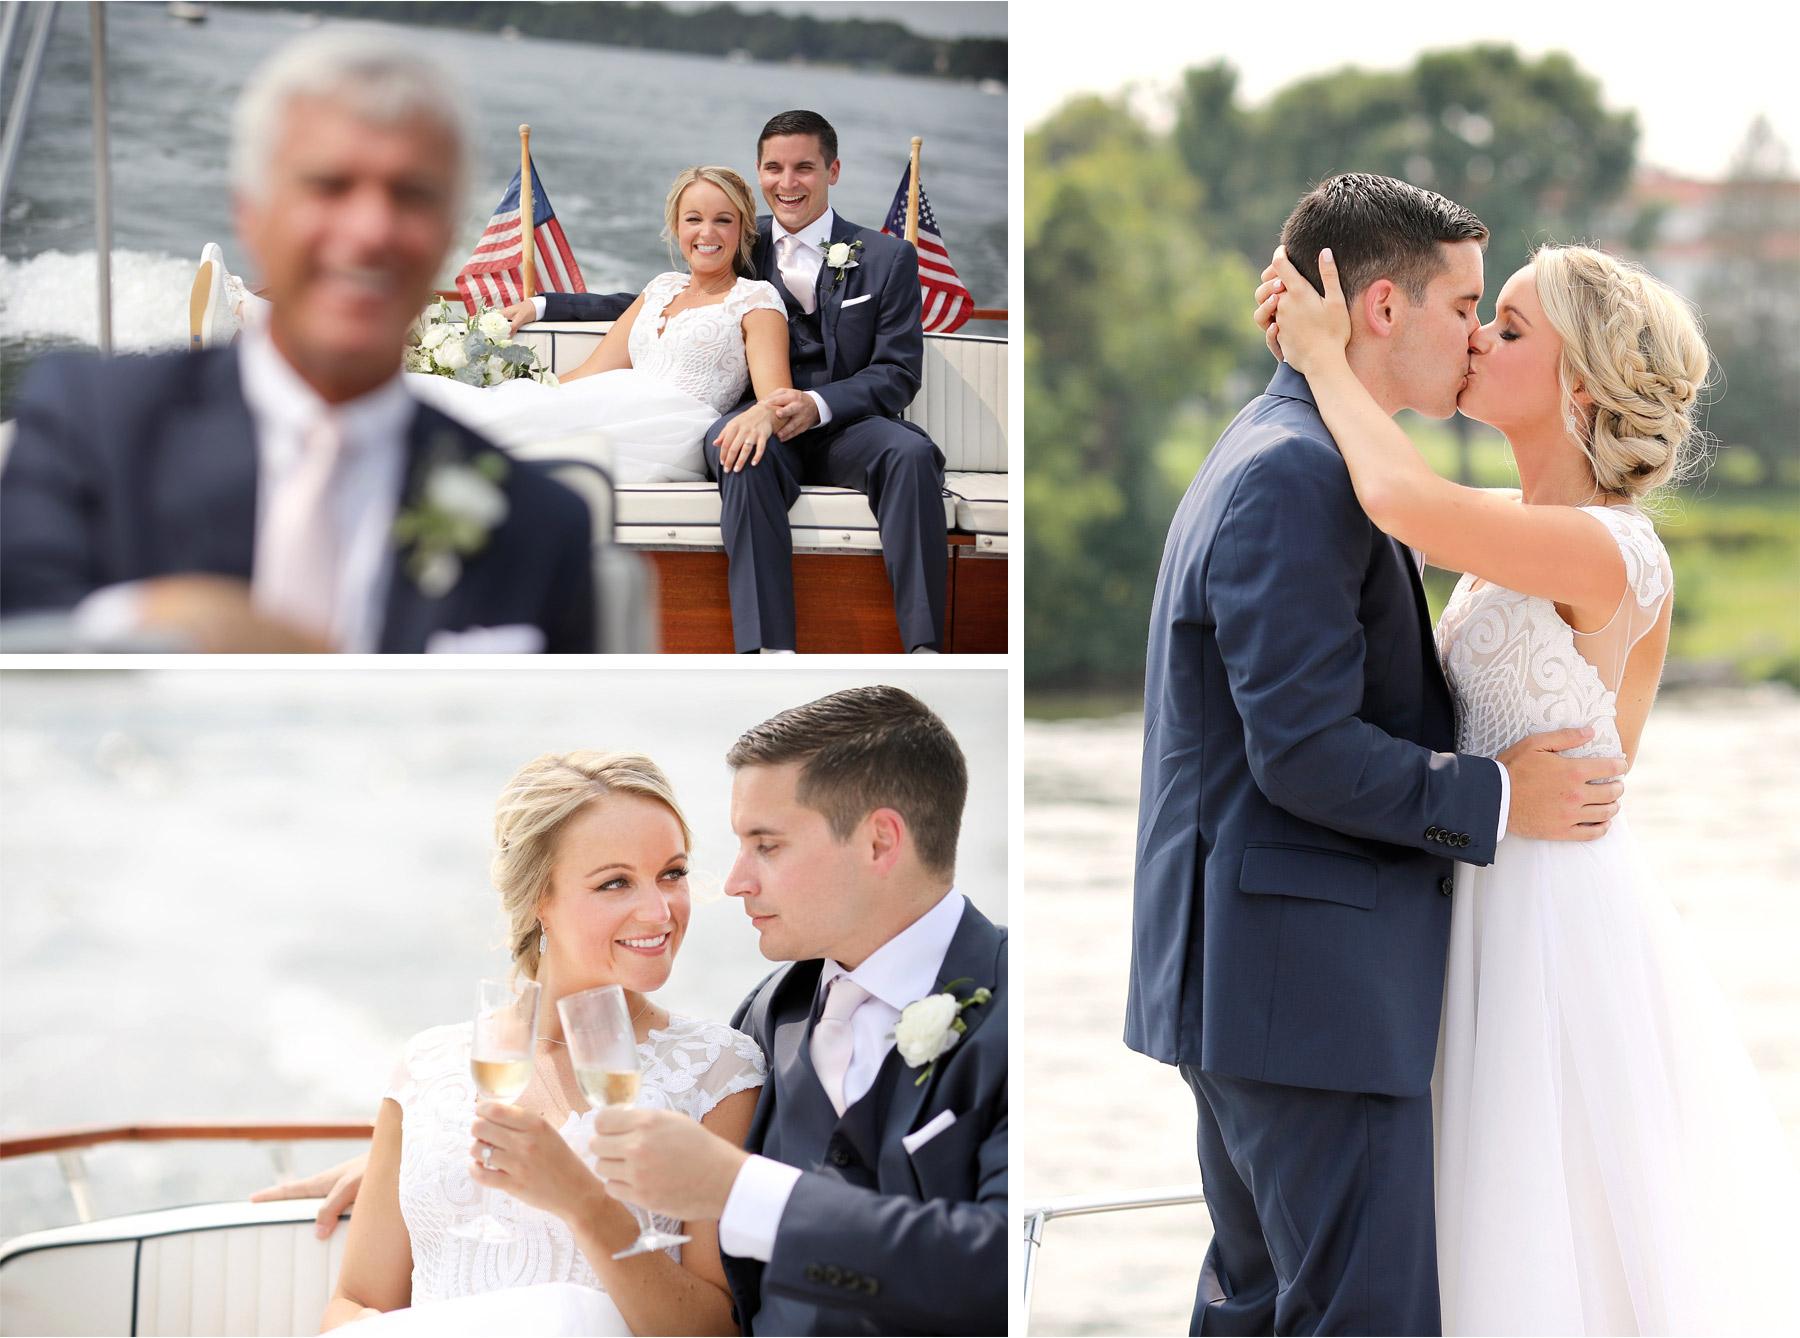 07-Minnetonka-Minnesota-Wedding-Photography-by-Vick-Photography-Boat-Lake-Minnetonka-First-Meeting-Jennifer-and-Adam.jpg